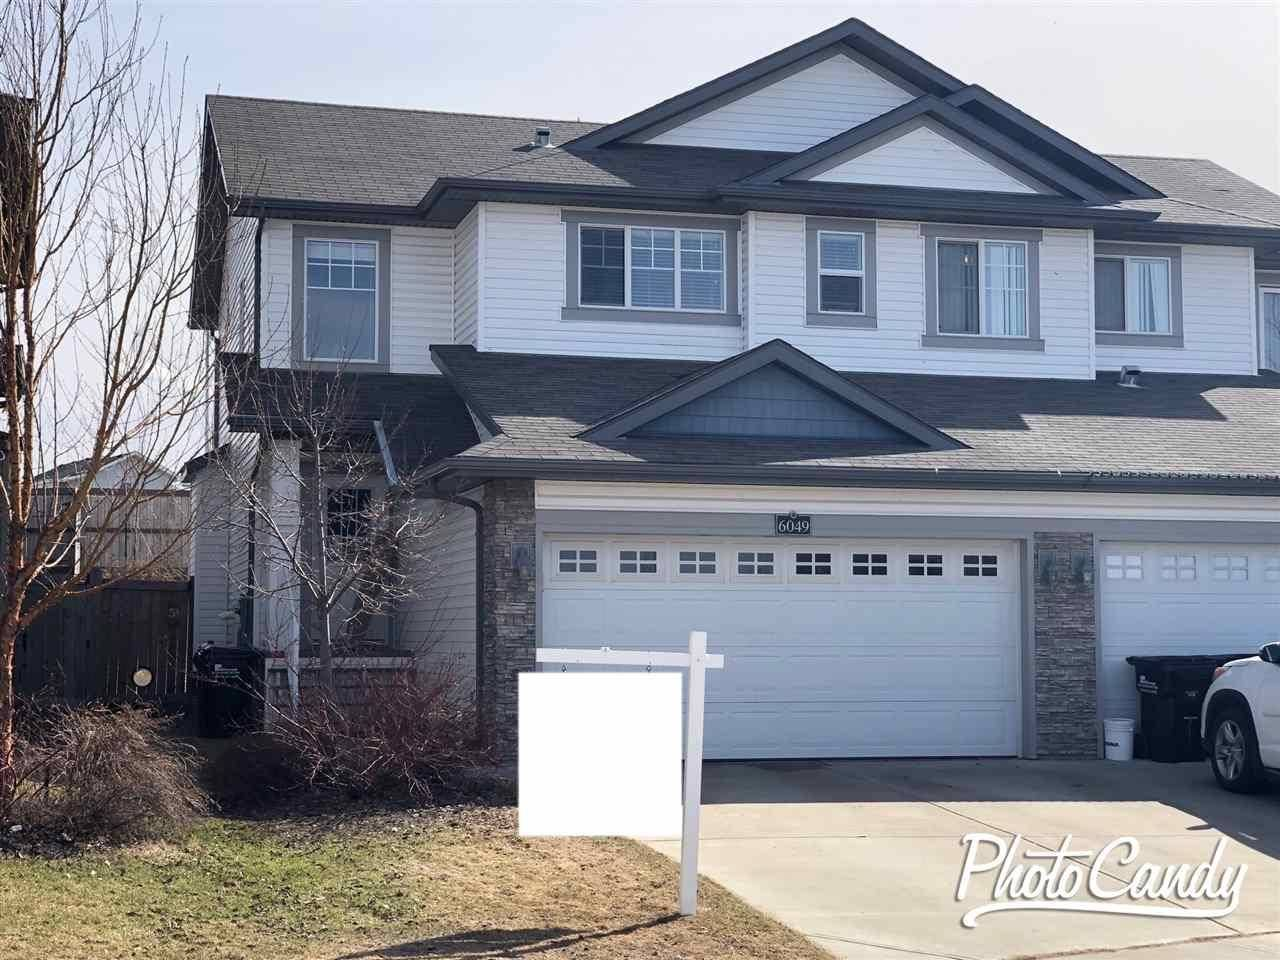 Townhouse for sale at 6049 Sunbrook Landng Sherwood Park Alberta - MLS: E4194171